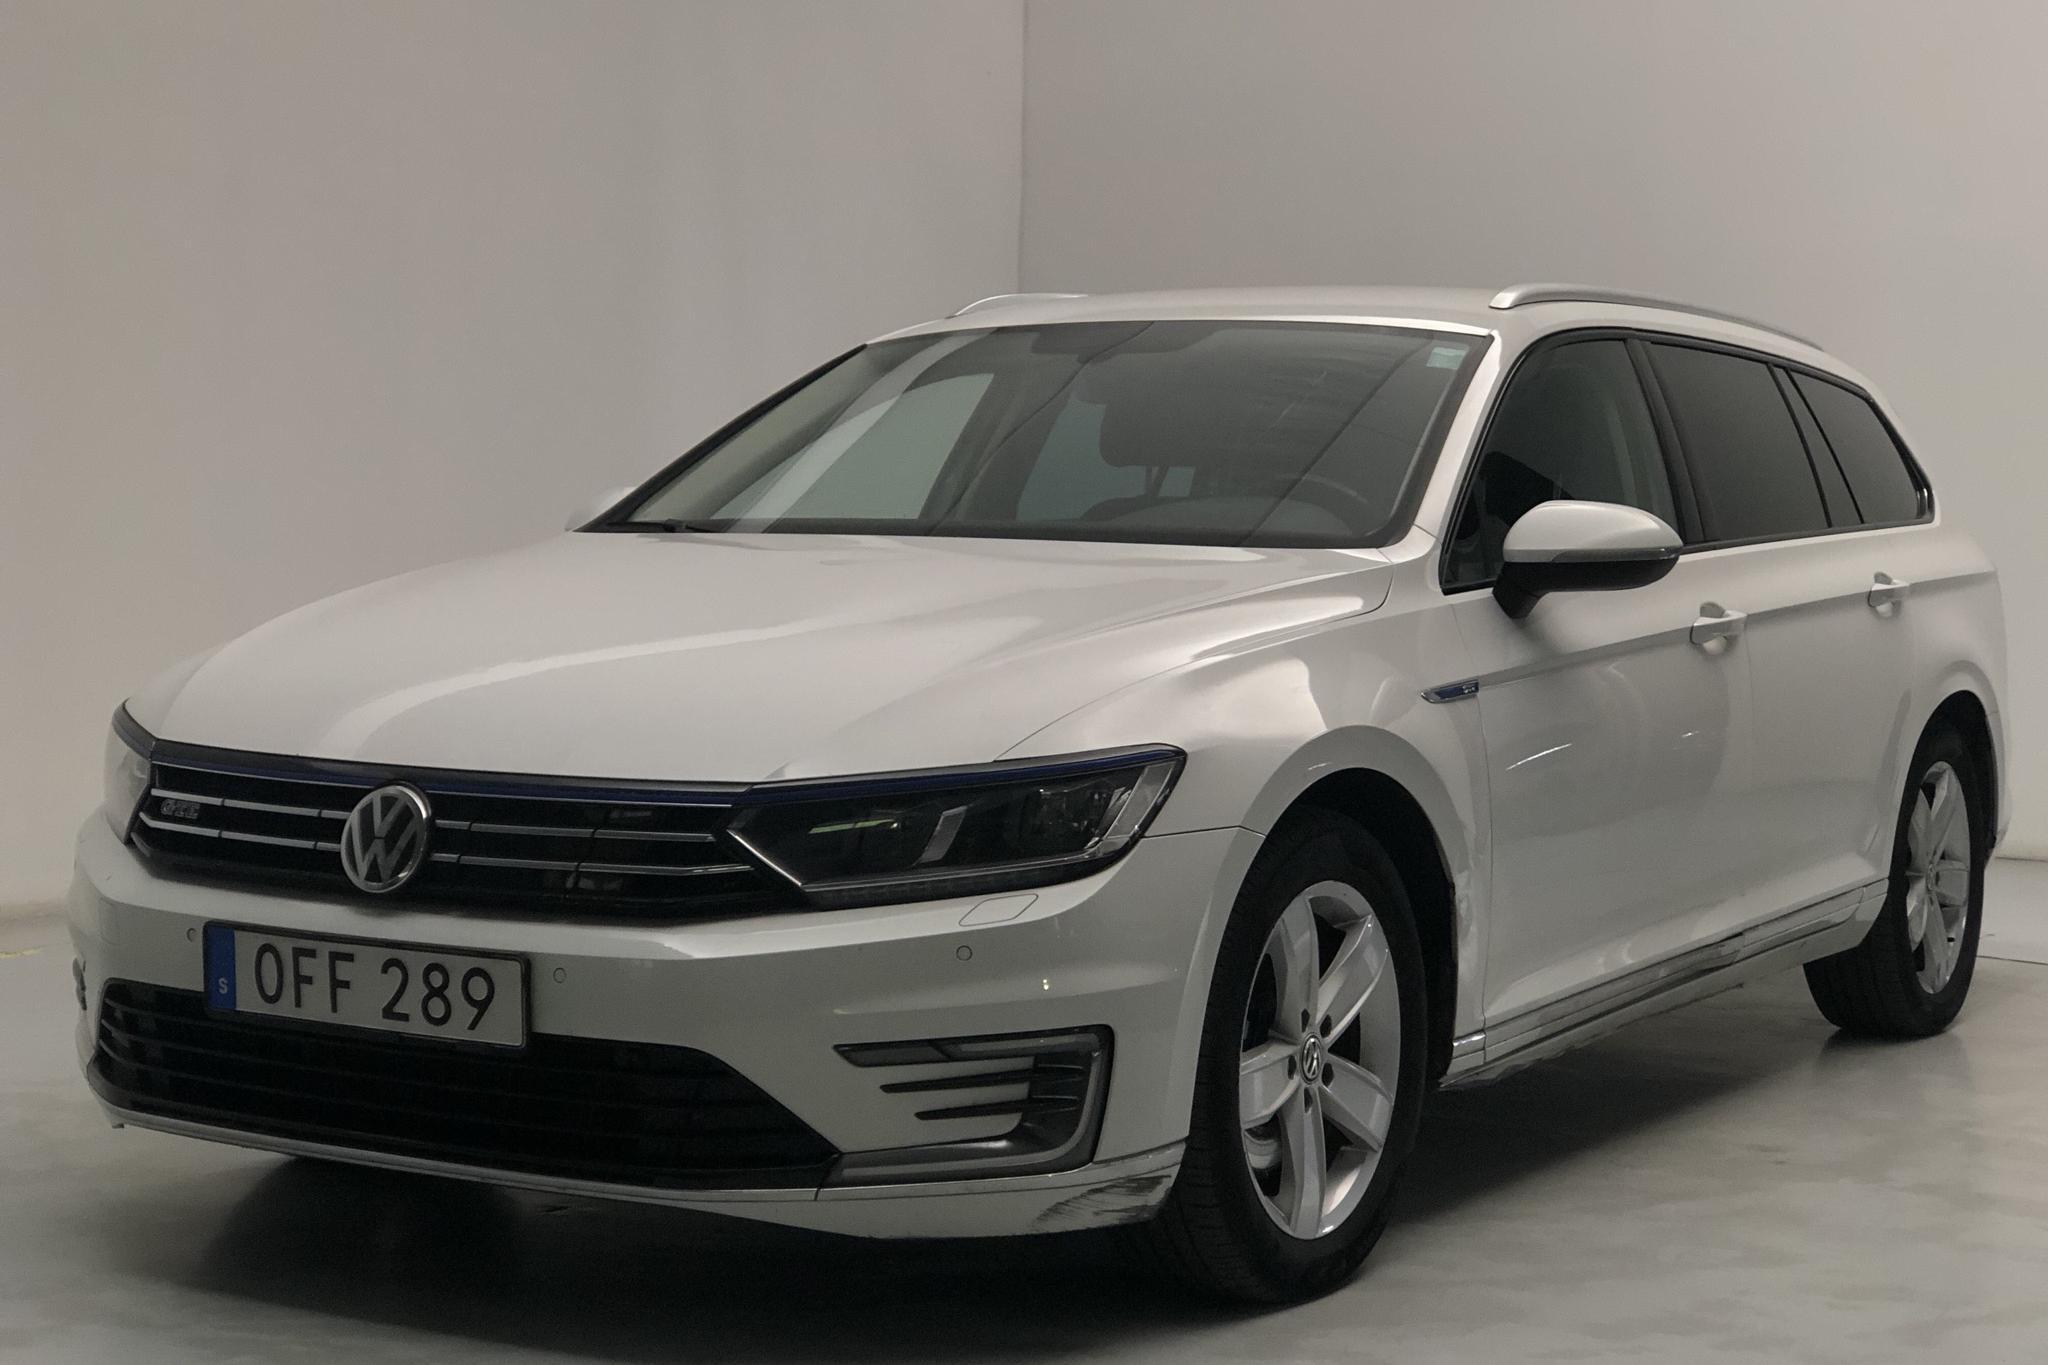 VW Passat 1.4 Plug-in-Hybrid Sportscombi (218hk) - 115 520 km - Automatic - white - 2017